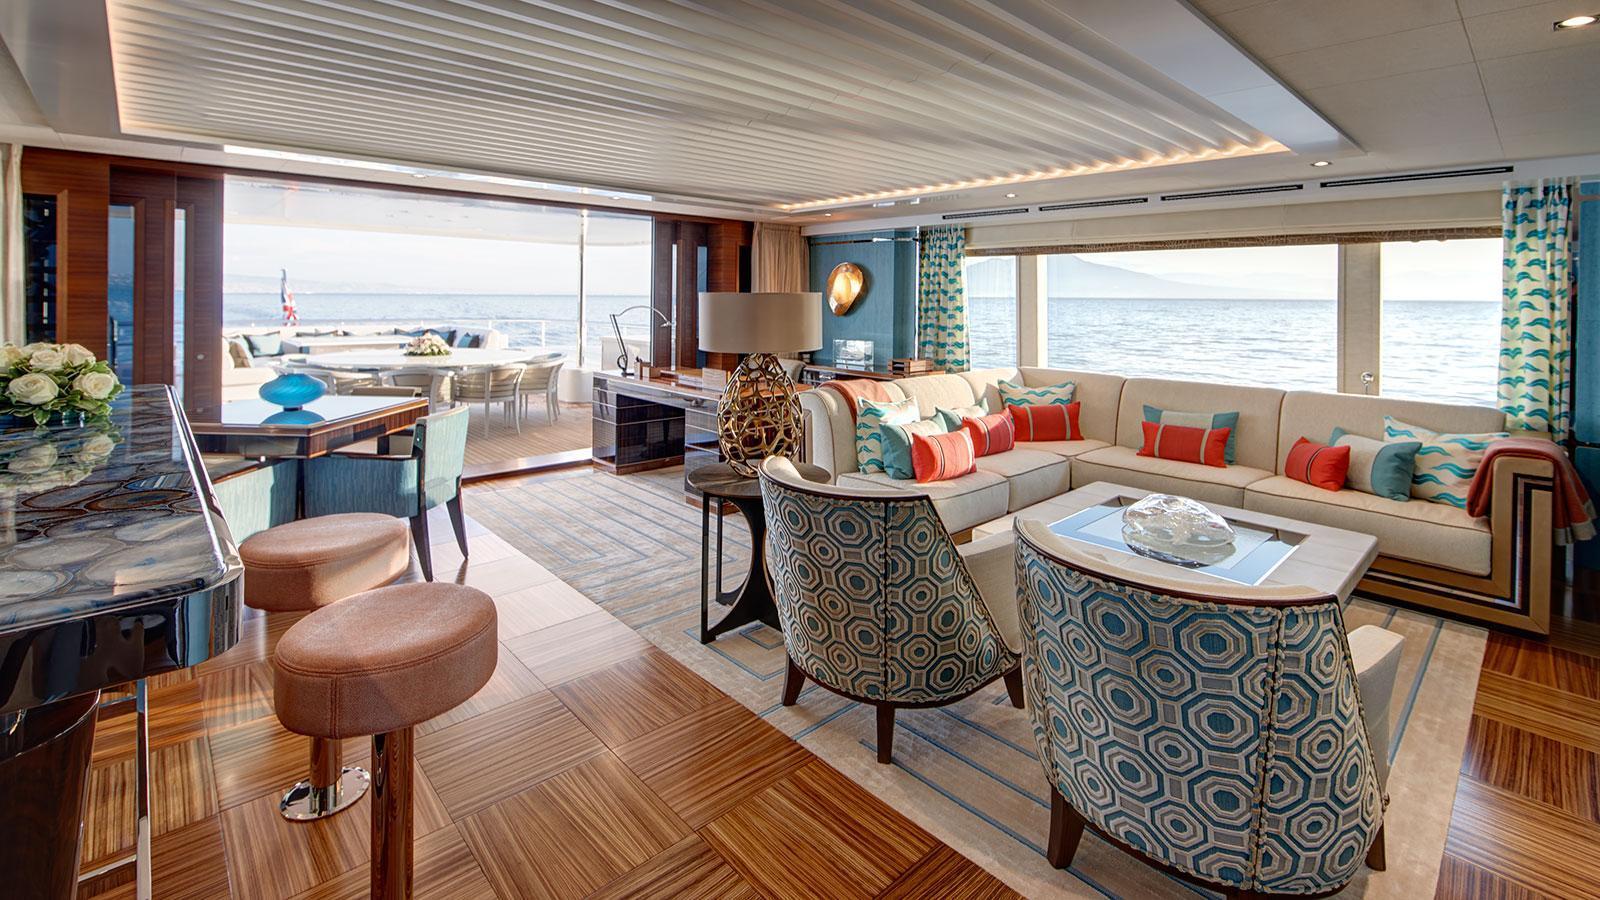 moon-sand-motor-yacht-feadship-2015-44m-main-saloon